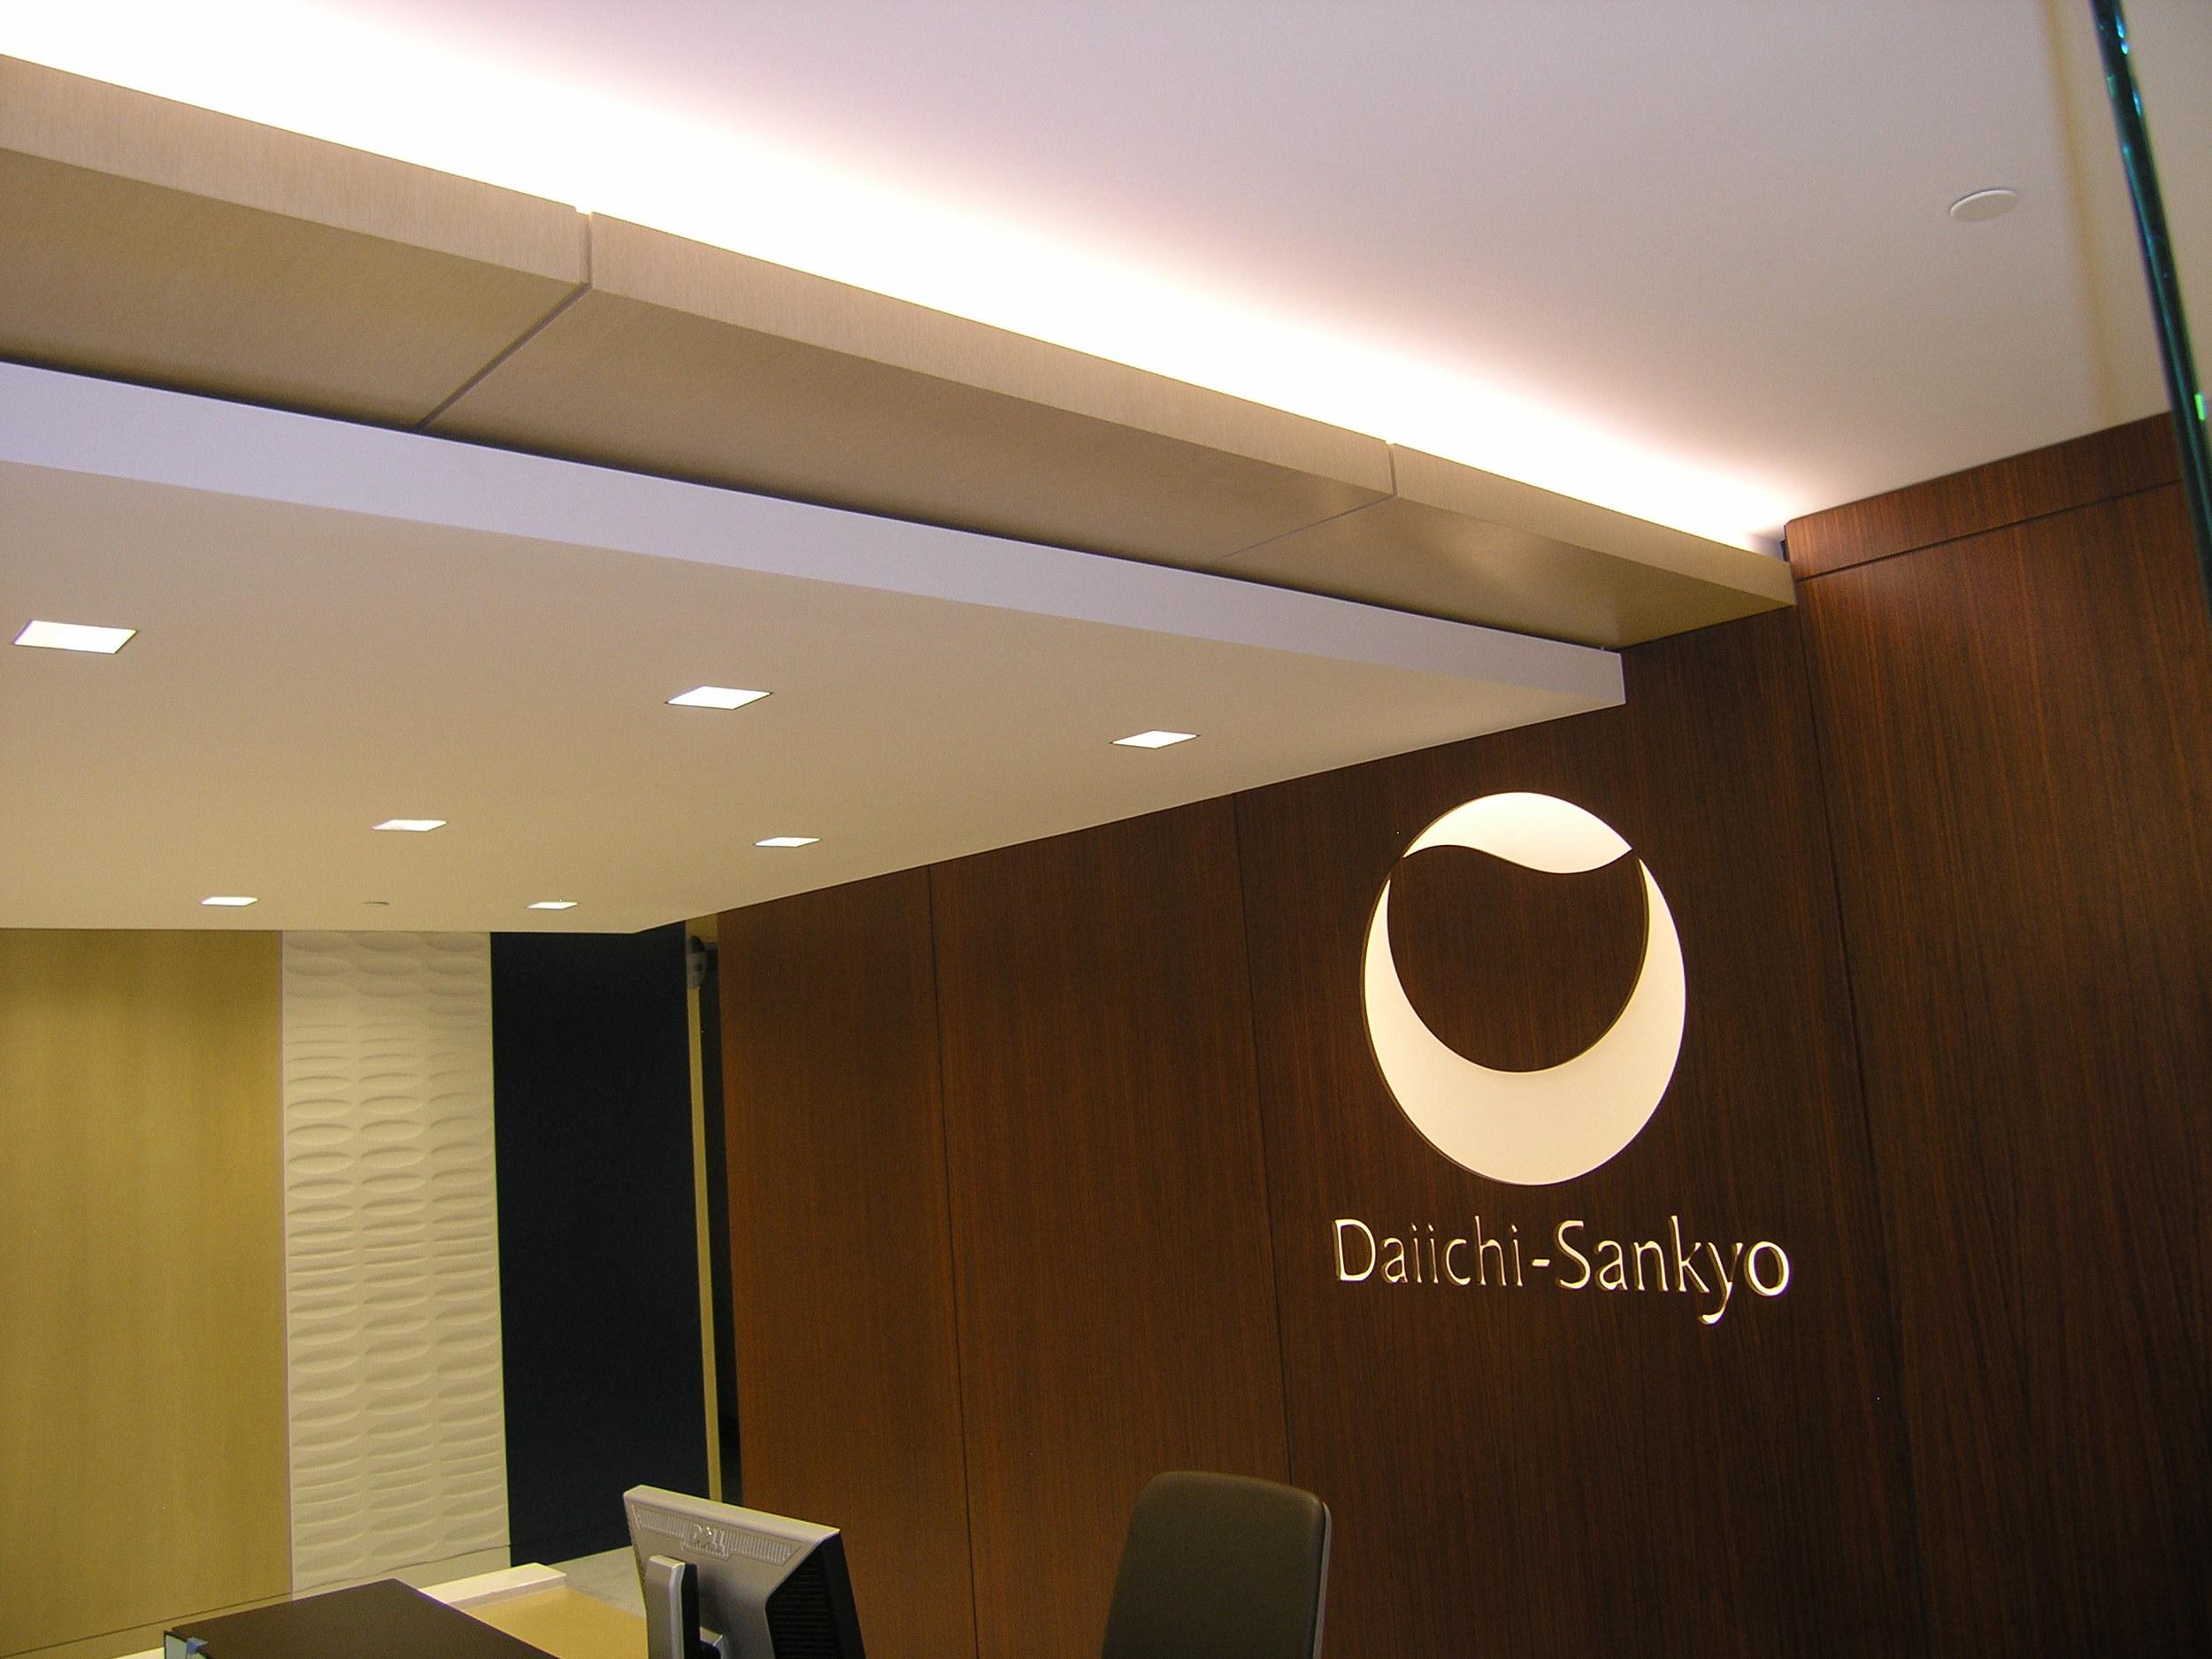 m_projects_0- Old Jobs_Daiichi Sankyo_DAIICHI SANKIO JOB 15143_PIX_Final_P1260237.JPG